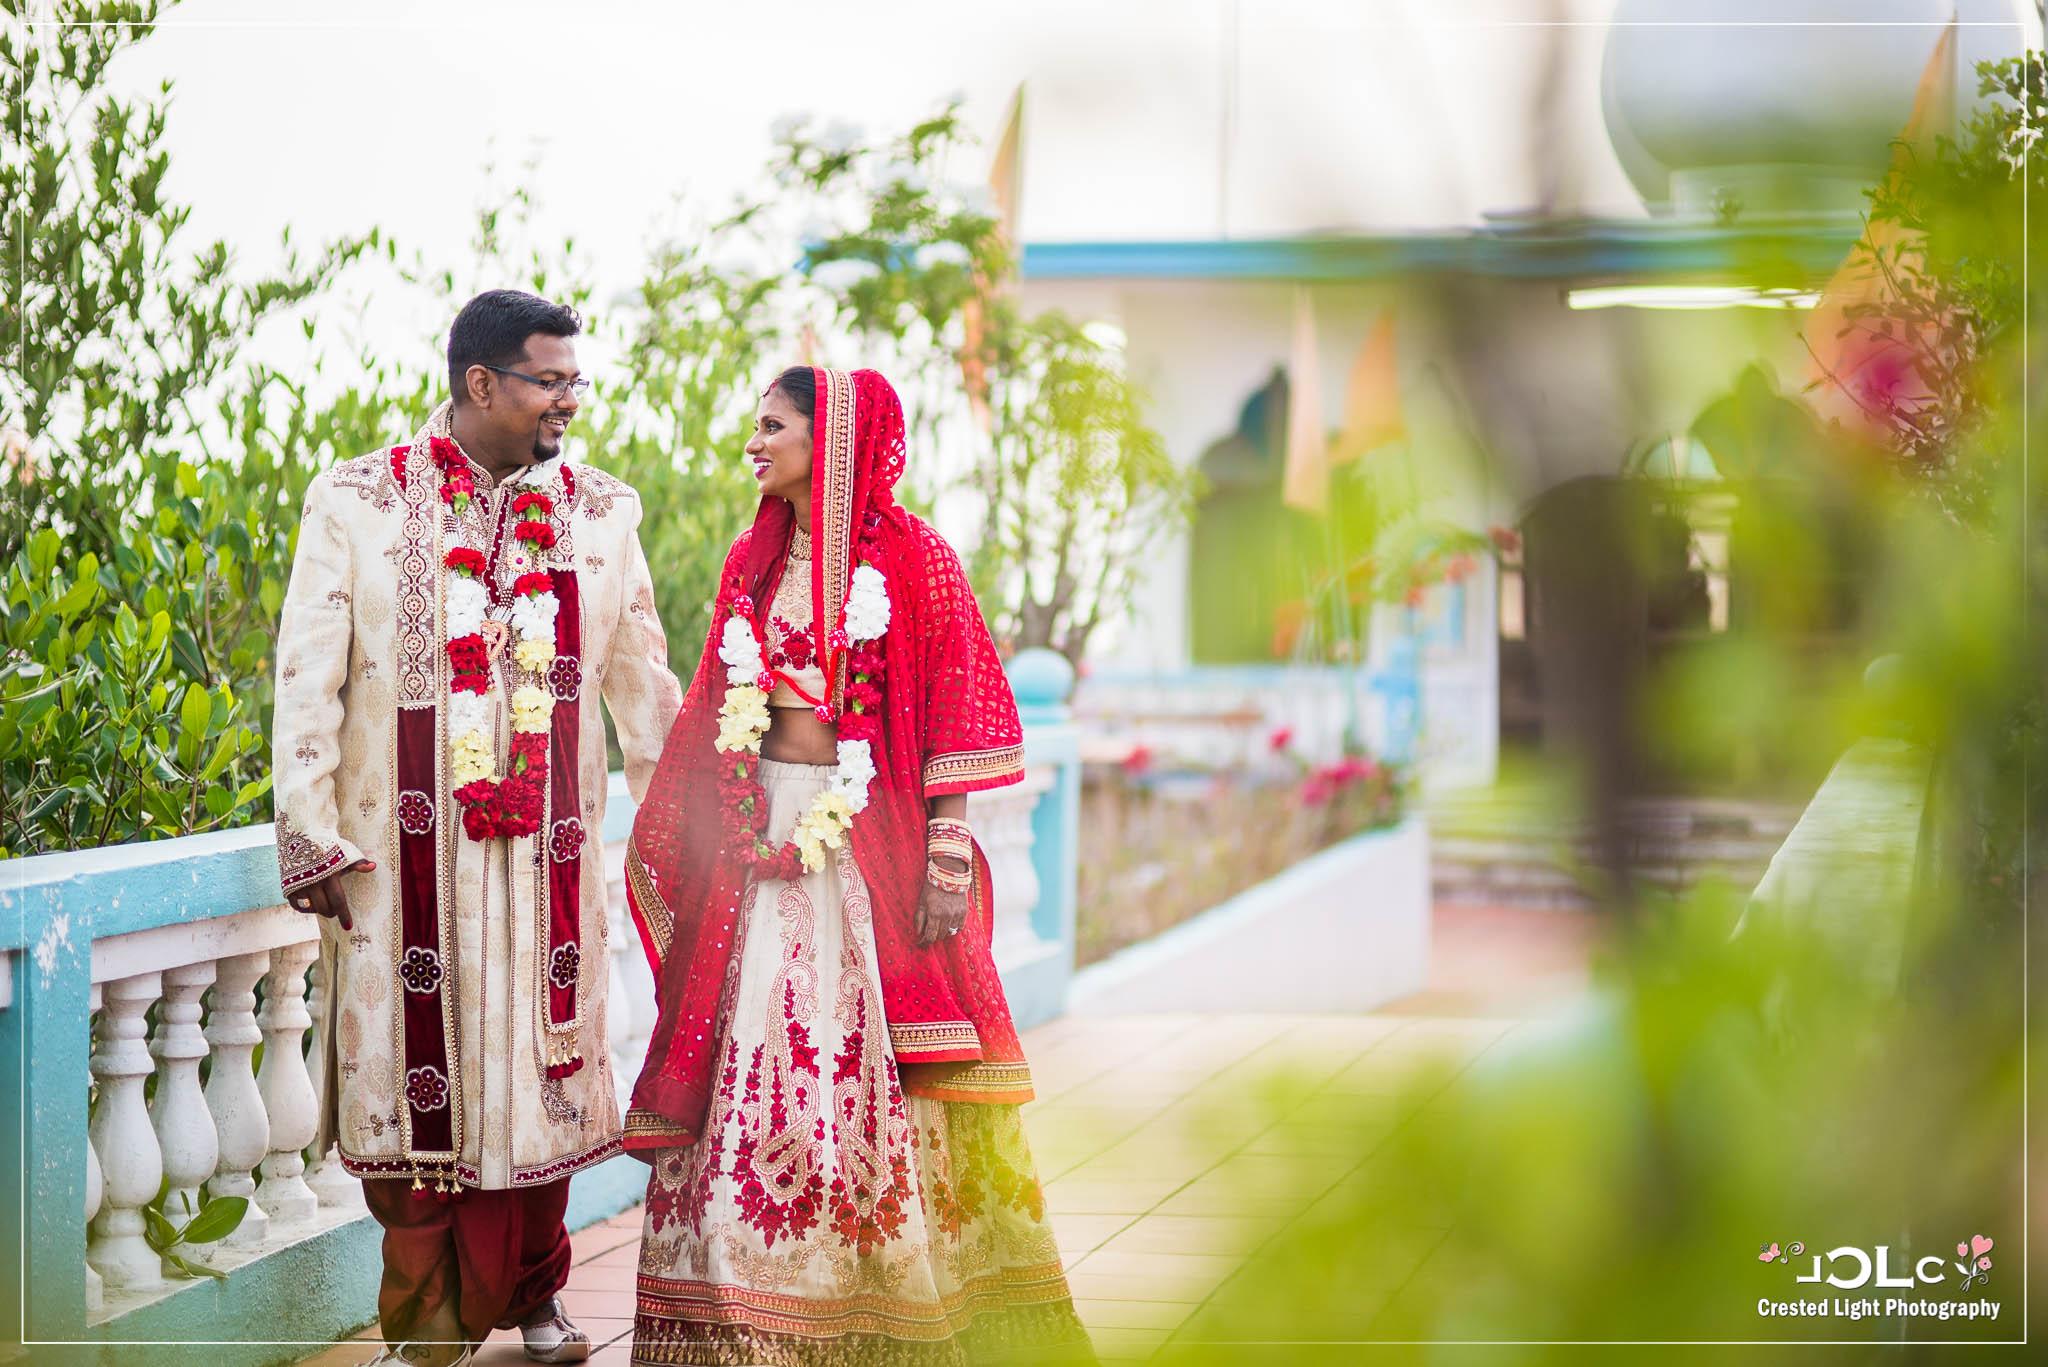 Temply by the Sea Waterloo Trinidad Hindu wedding 03.jpg